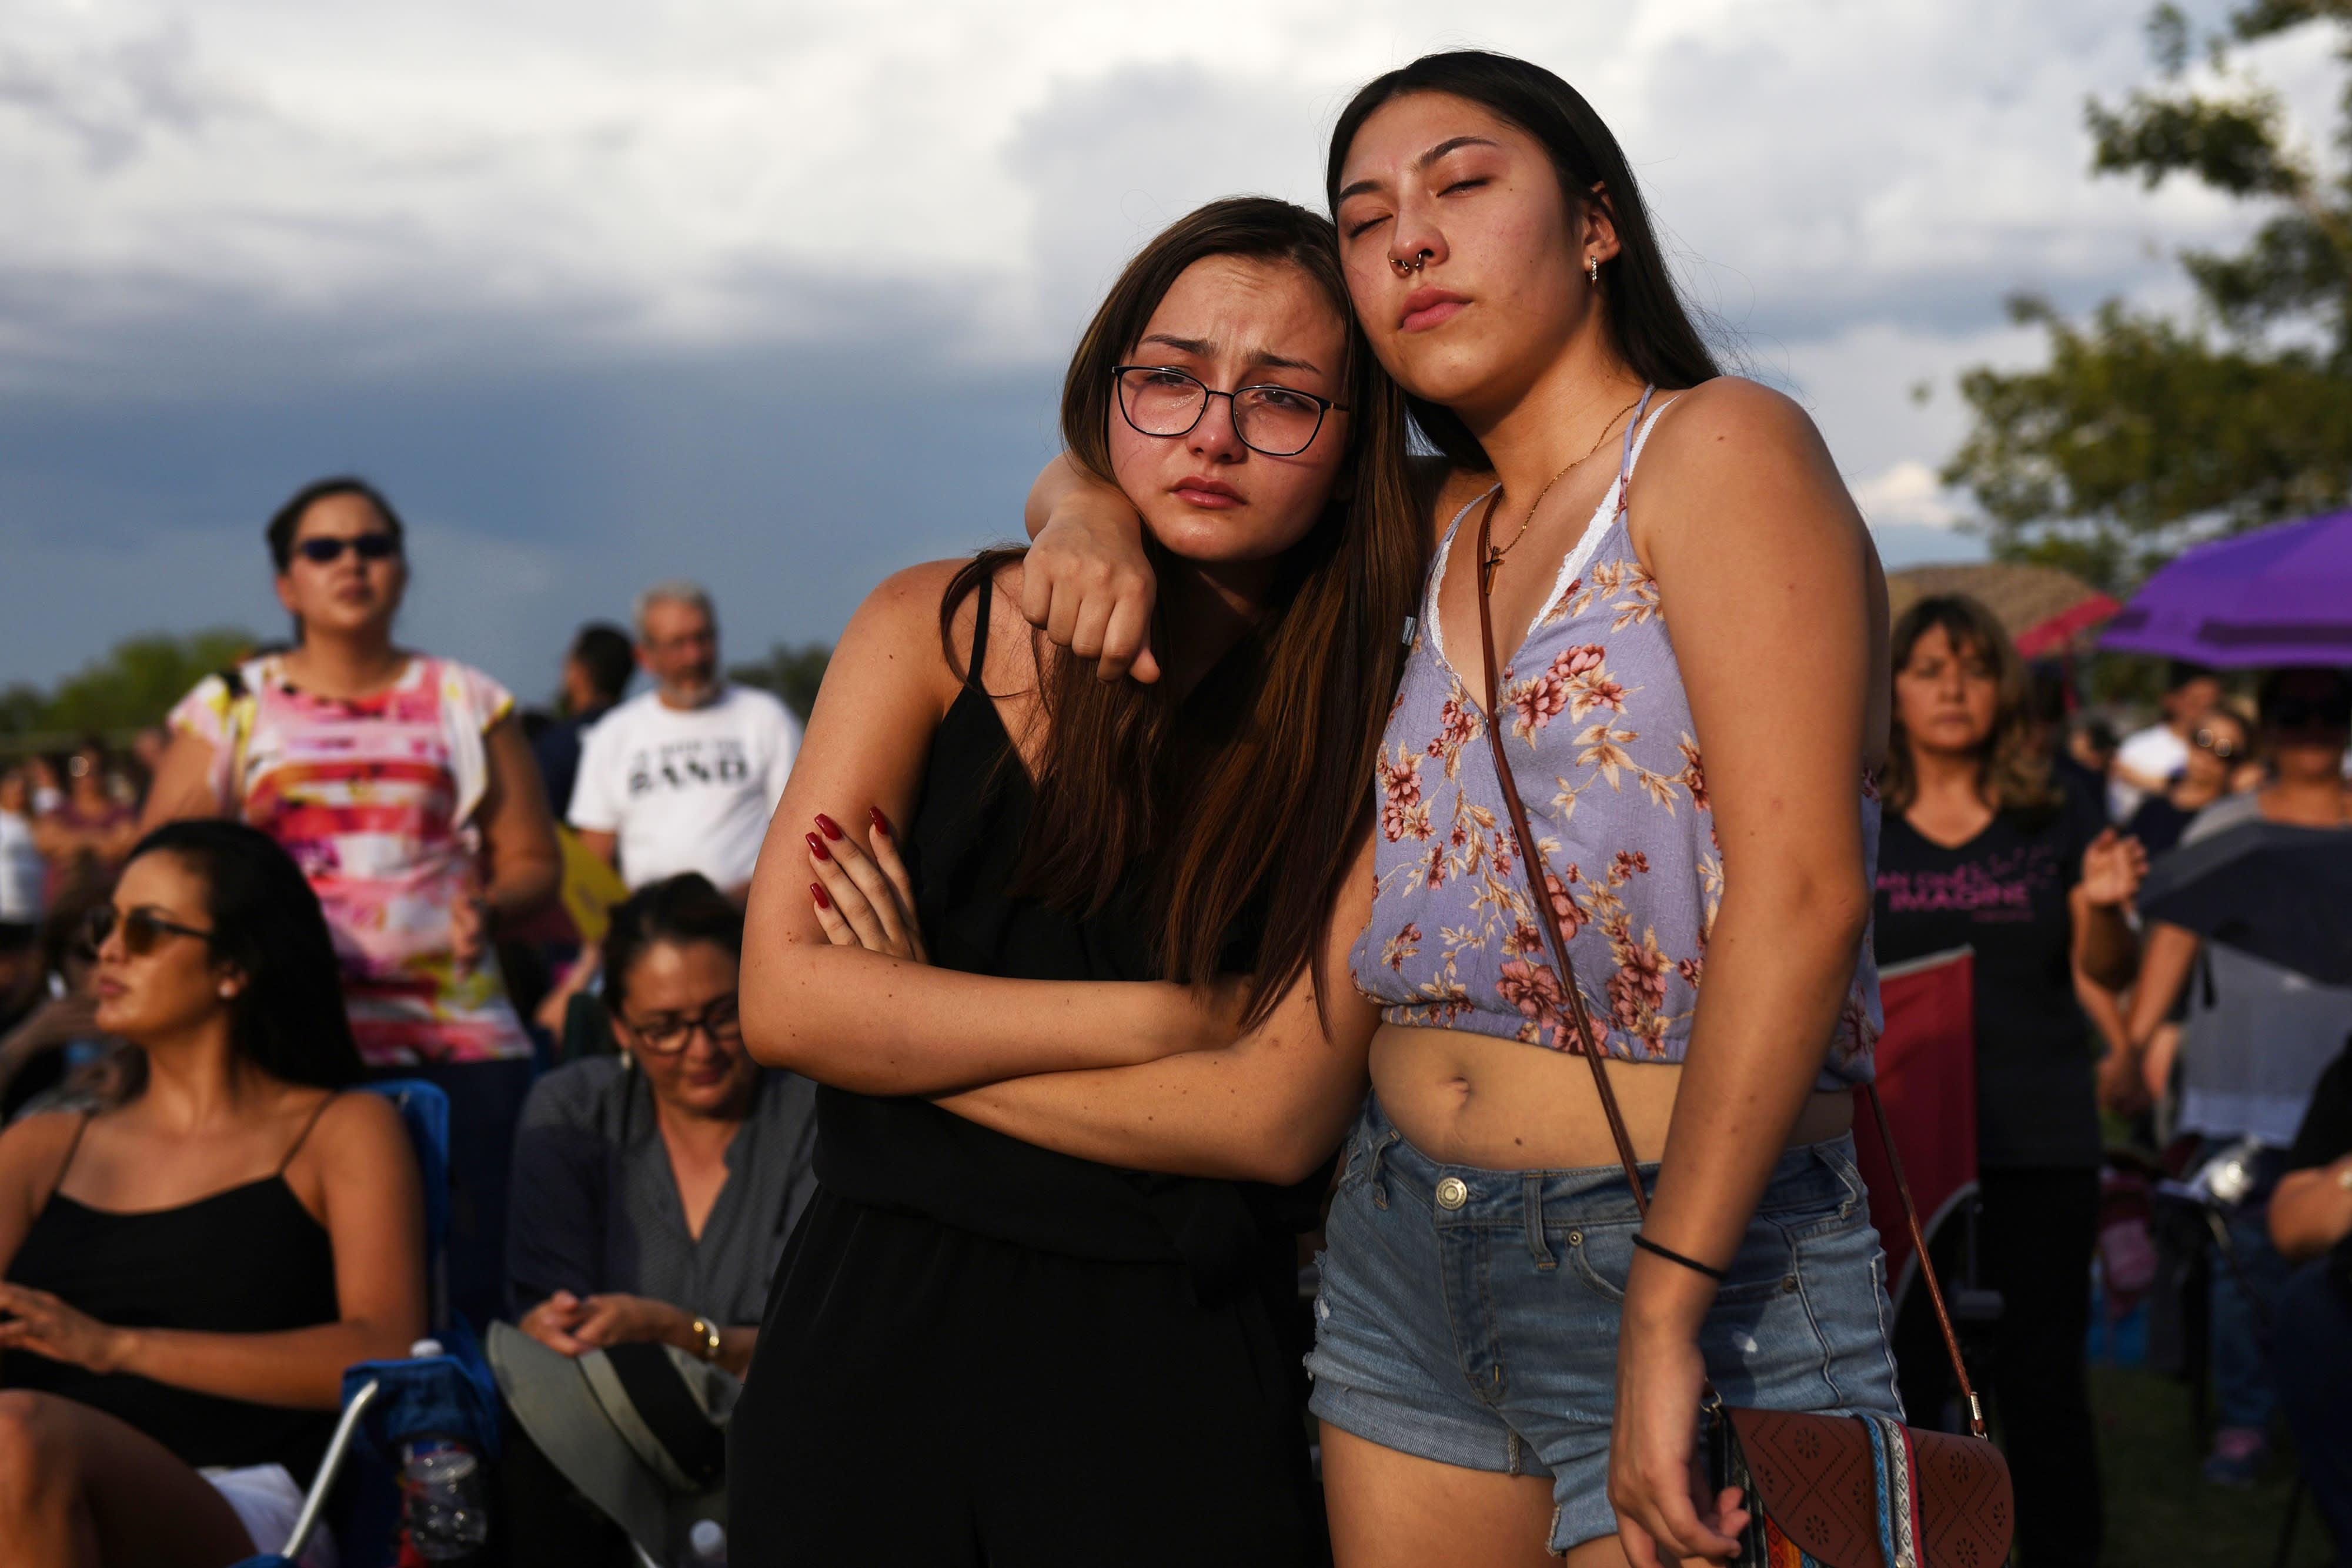 2020 Democratic candidates announce plans to combat gun violence, white nationalism following El Paso, Dayton massacres